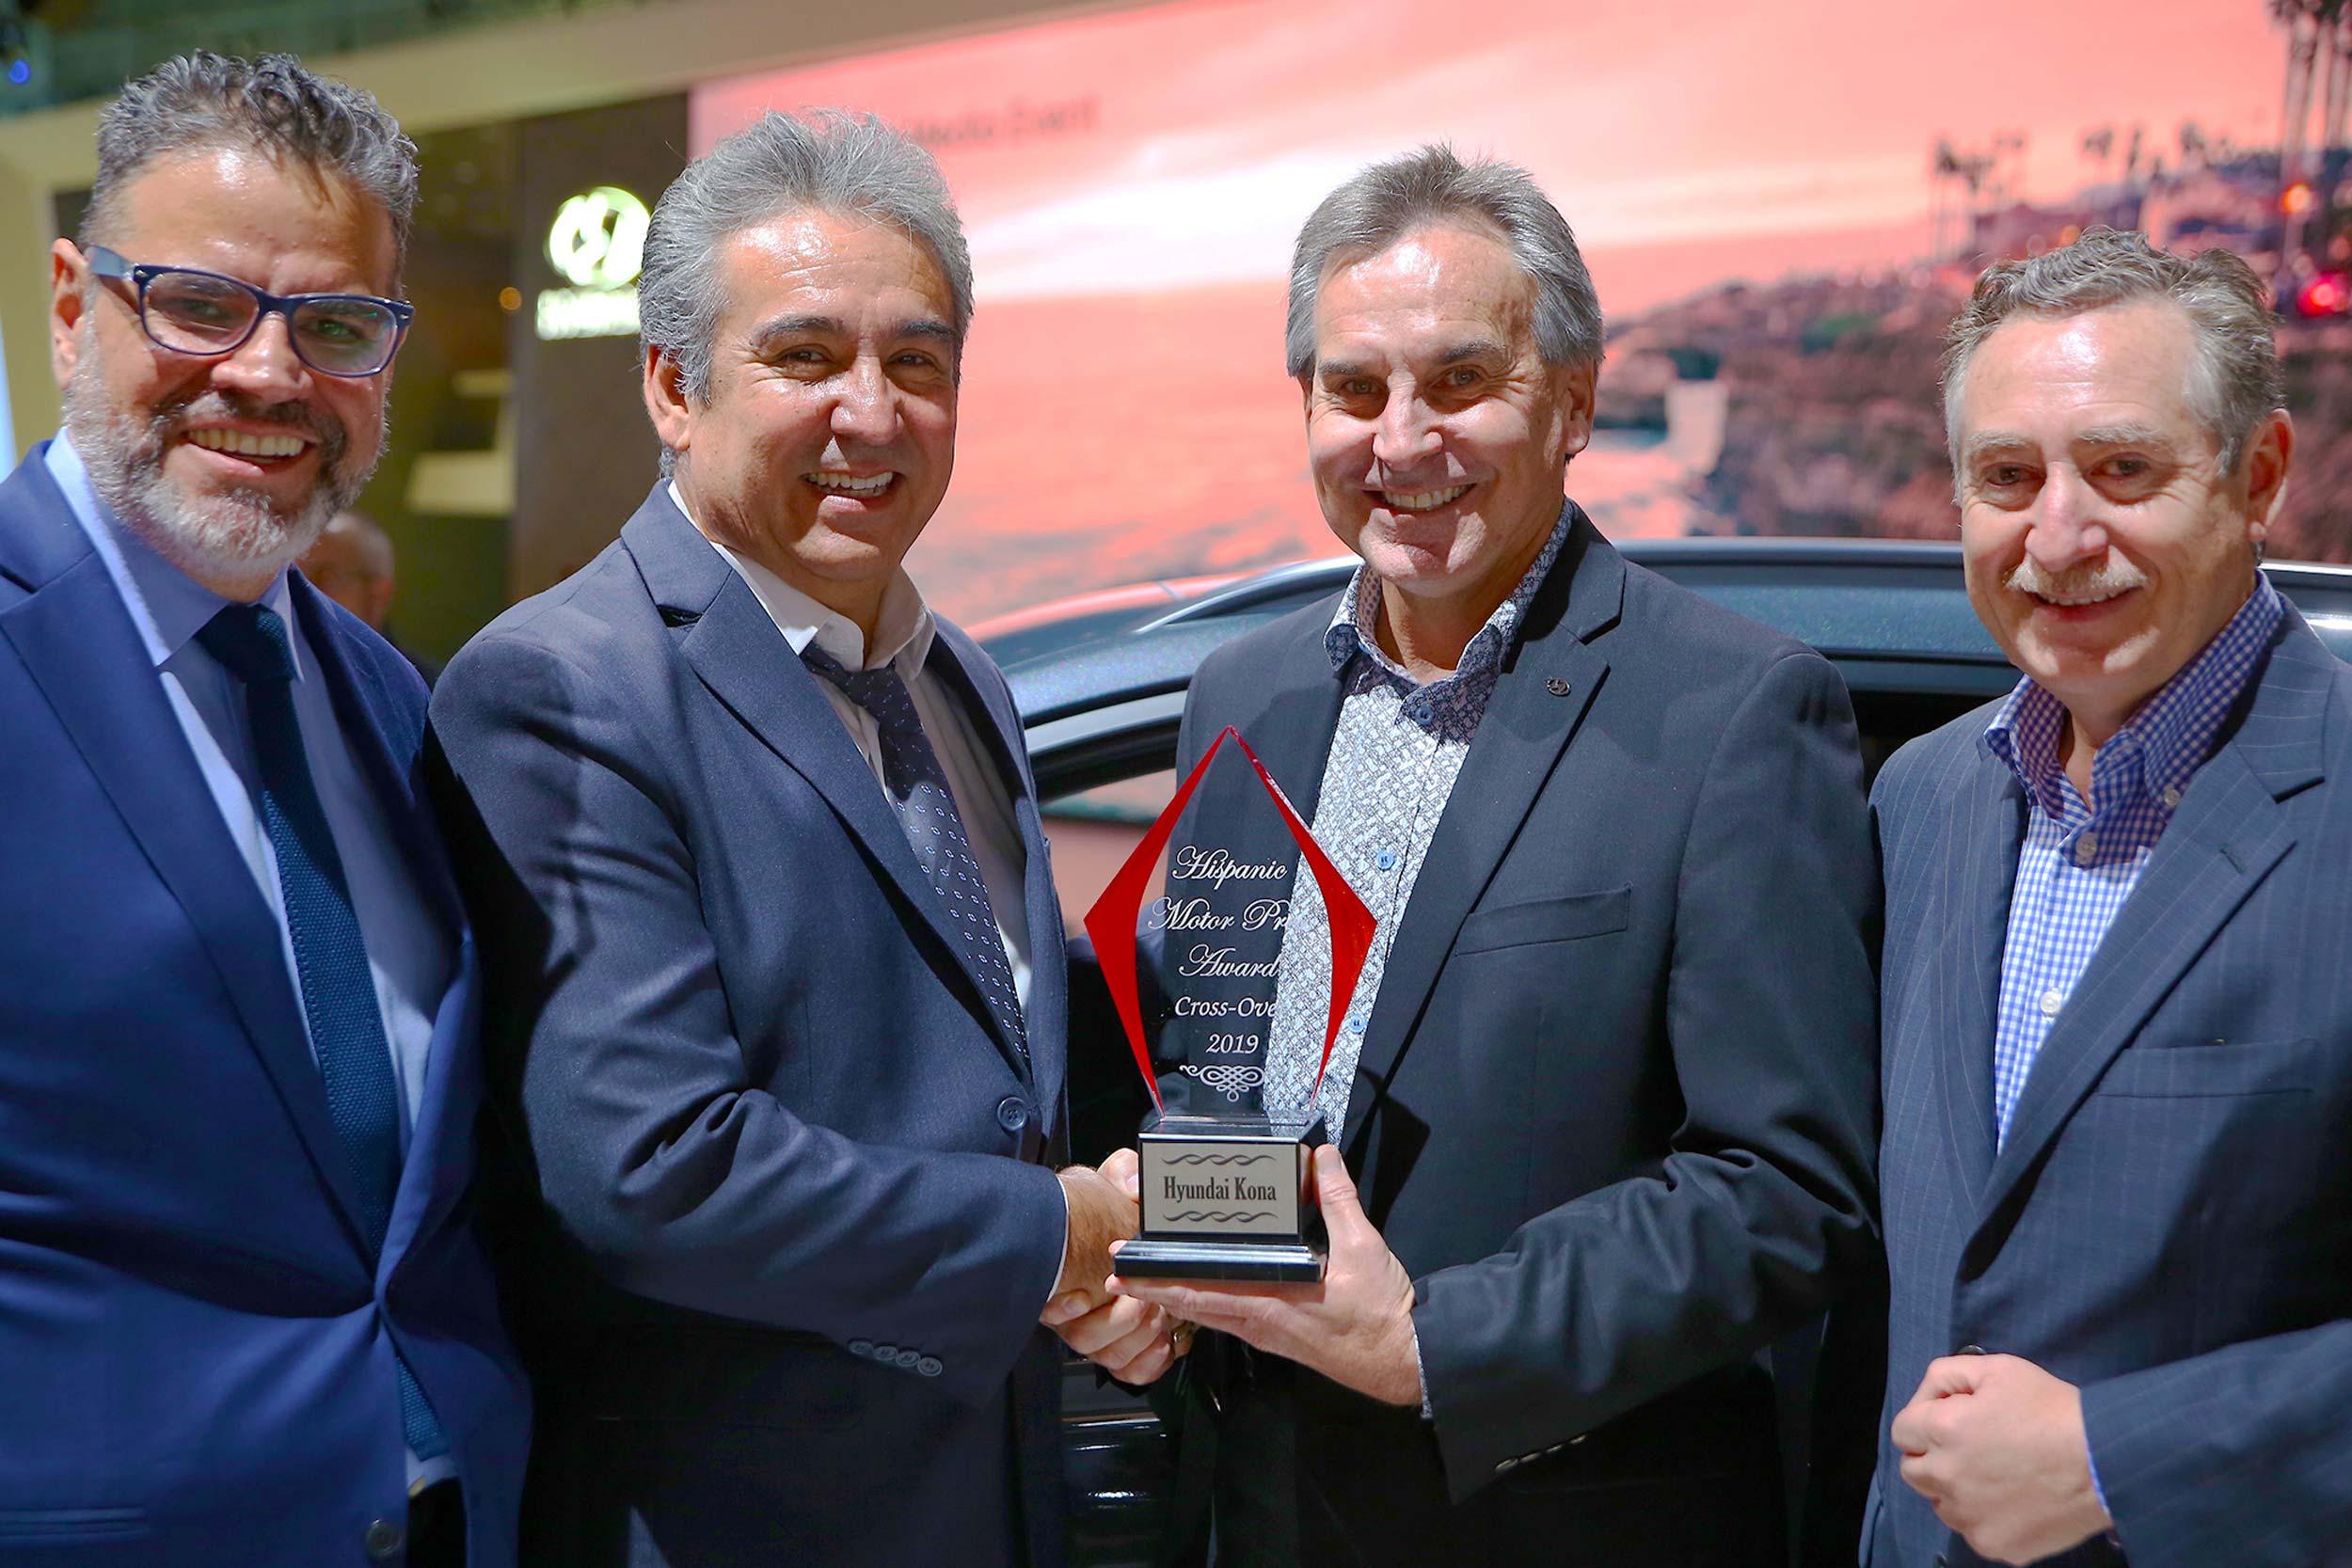 Hyundai Kona - Best Crossover for Hispanic Families